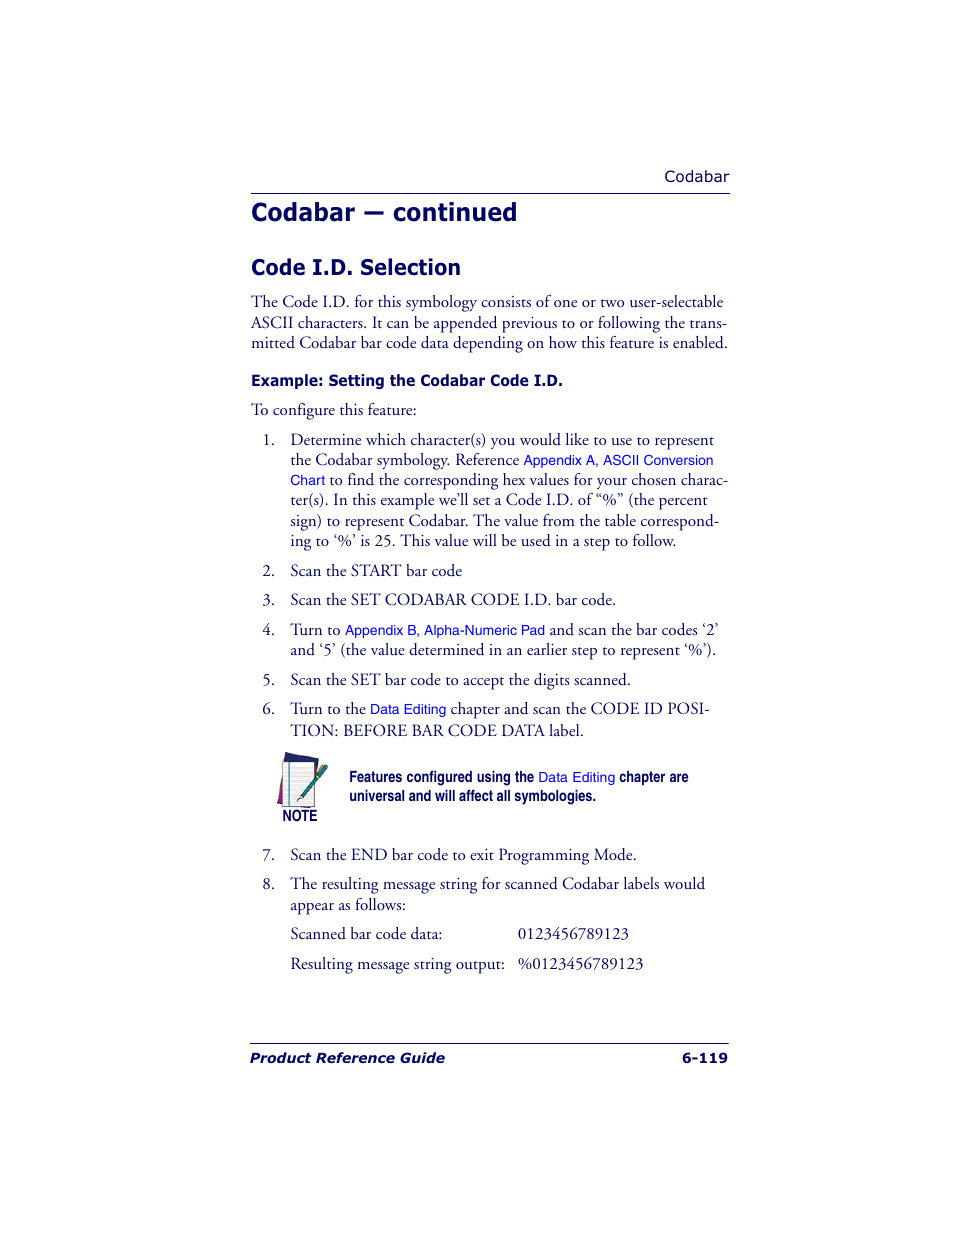 Codabar — continued, Code i.d. selection | Datalogic Scanning QUICKSCAN QS6500BT  User Manual | Page 207 / 336